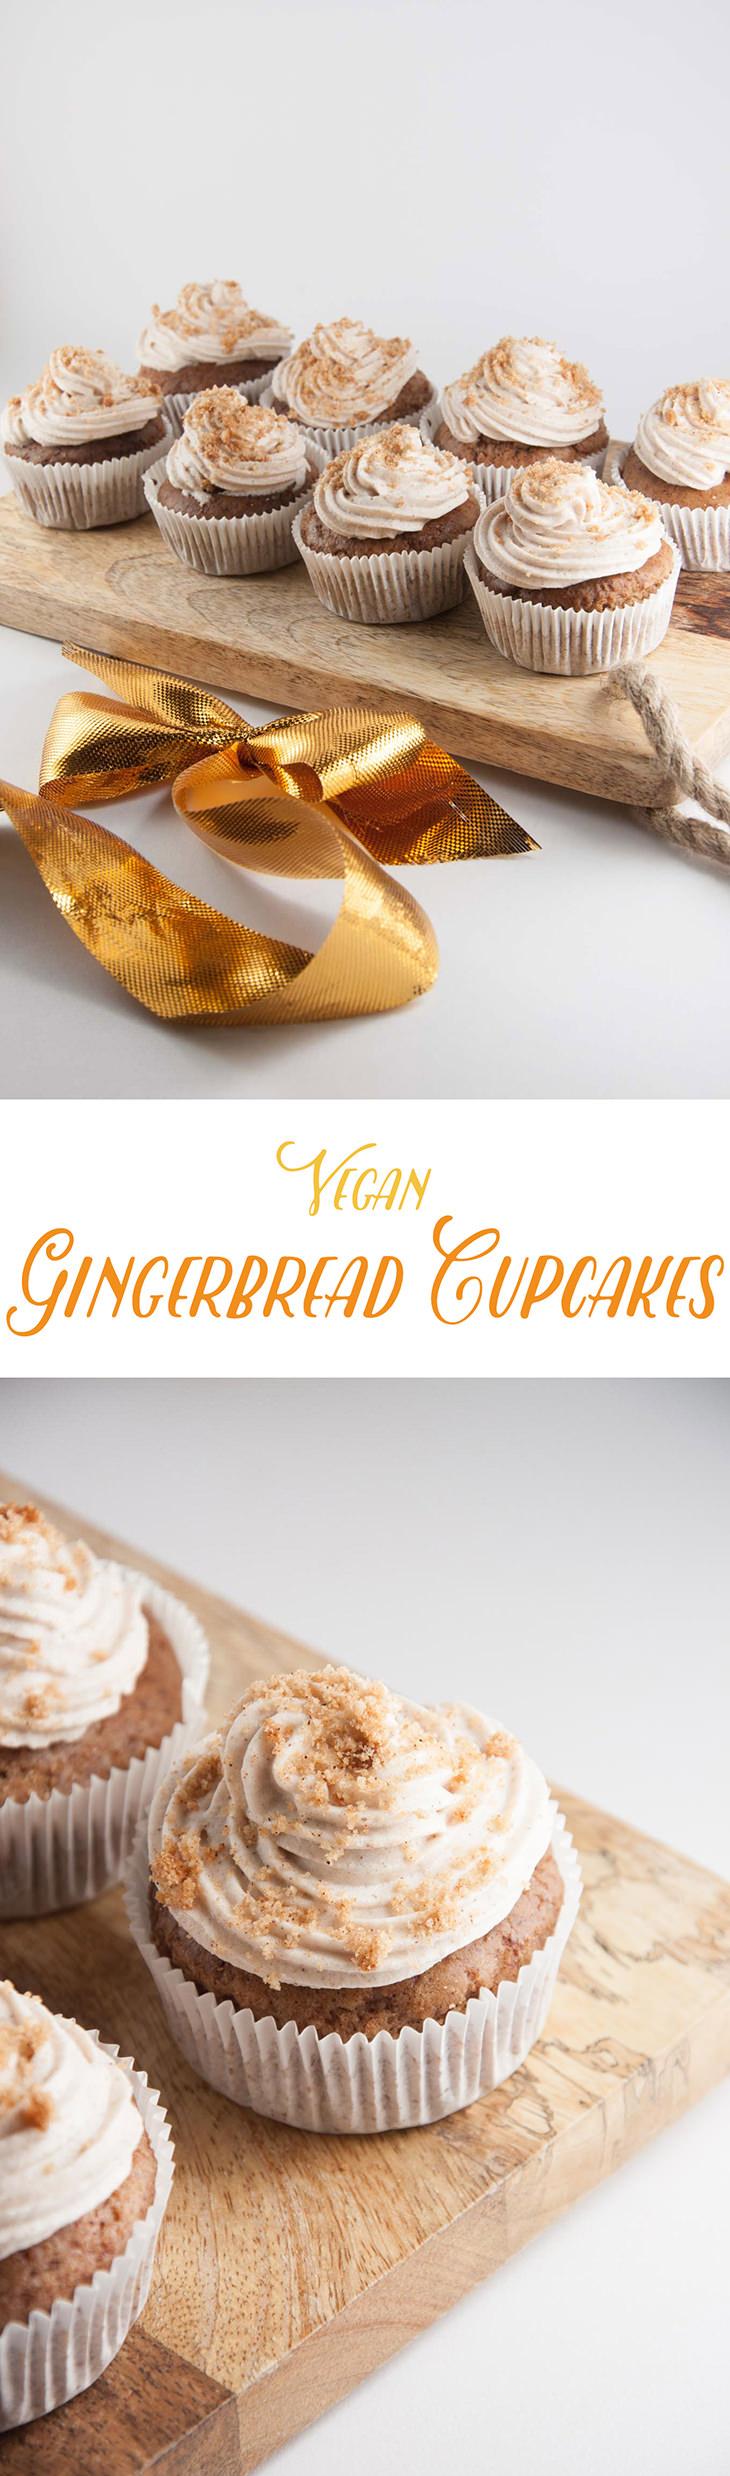 Vegan Gingerbread Cupcakes   ElephantasticVegan.com